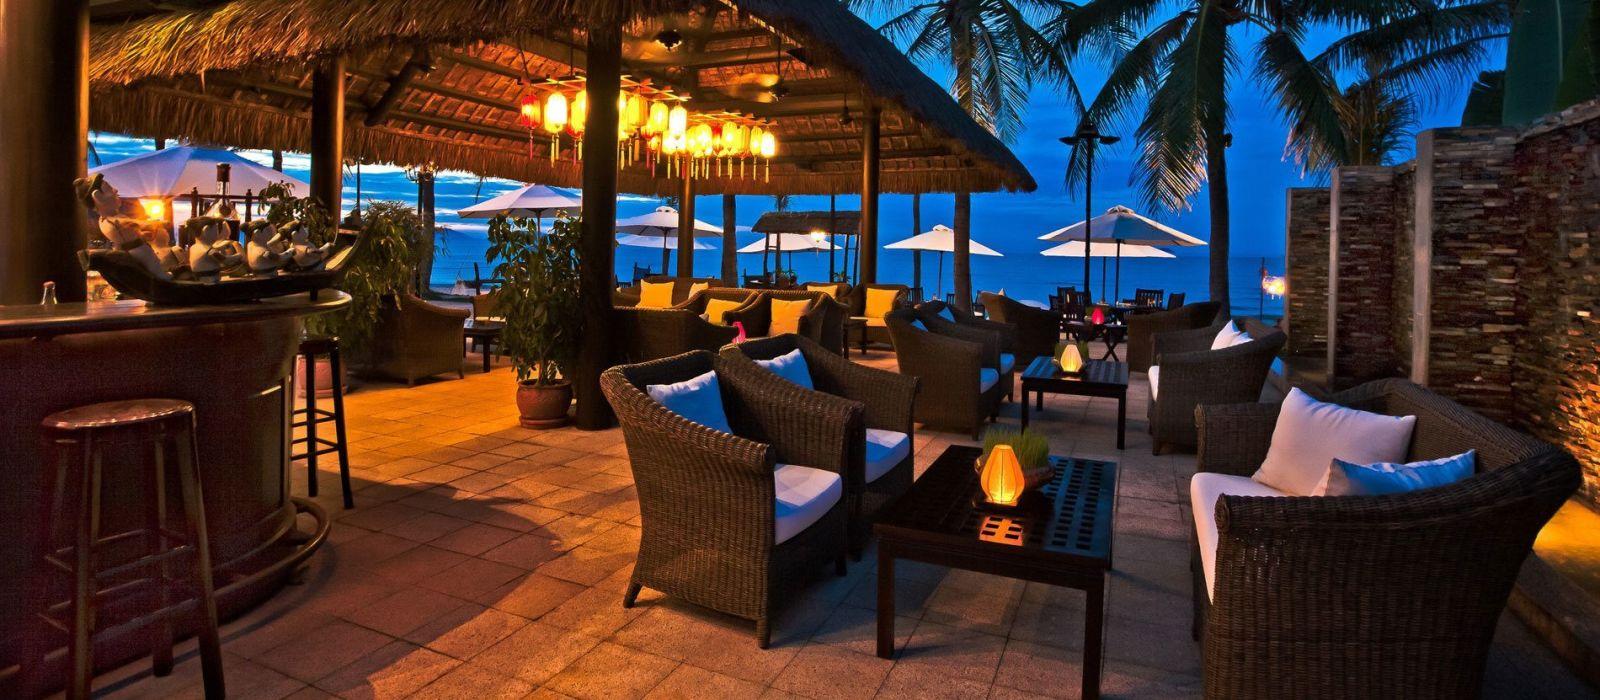 Hotel Victoria Beach Resort (Hoi An) Vietnam